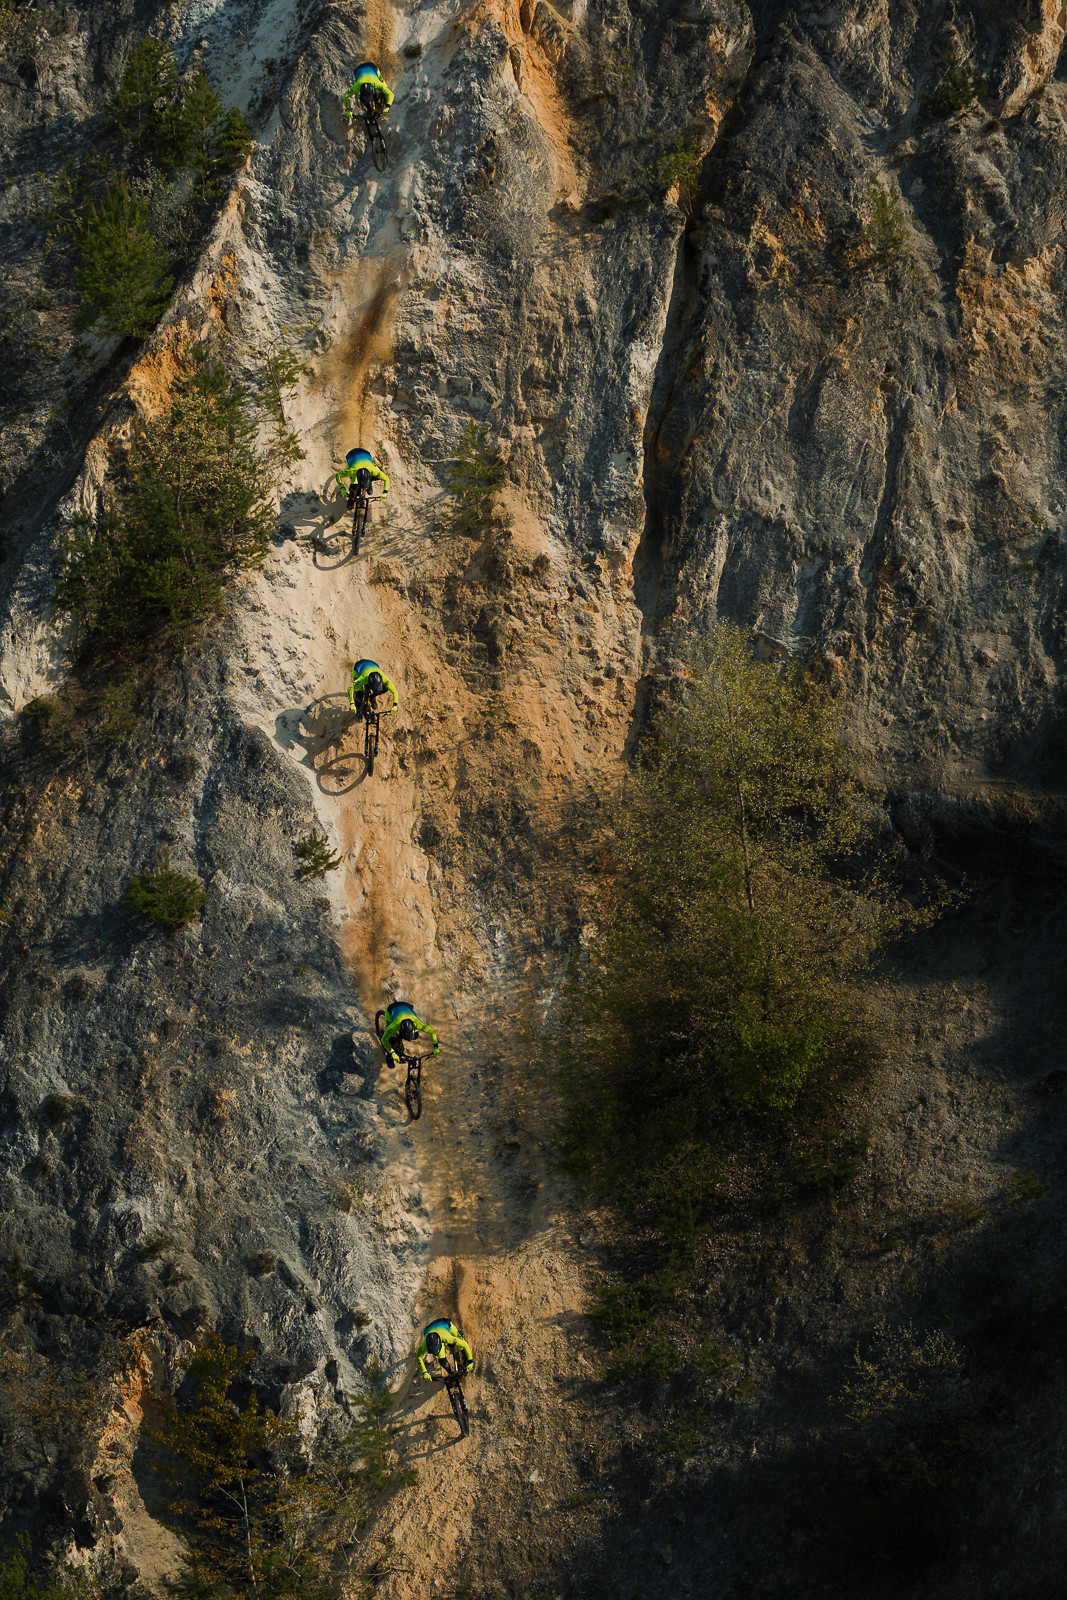 No plans - EWIA - Mountain Biking Pictures - Vital MTB